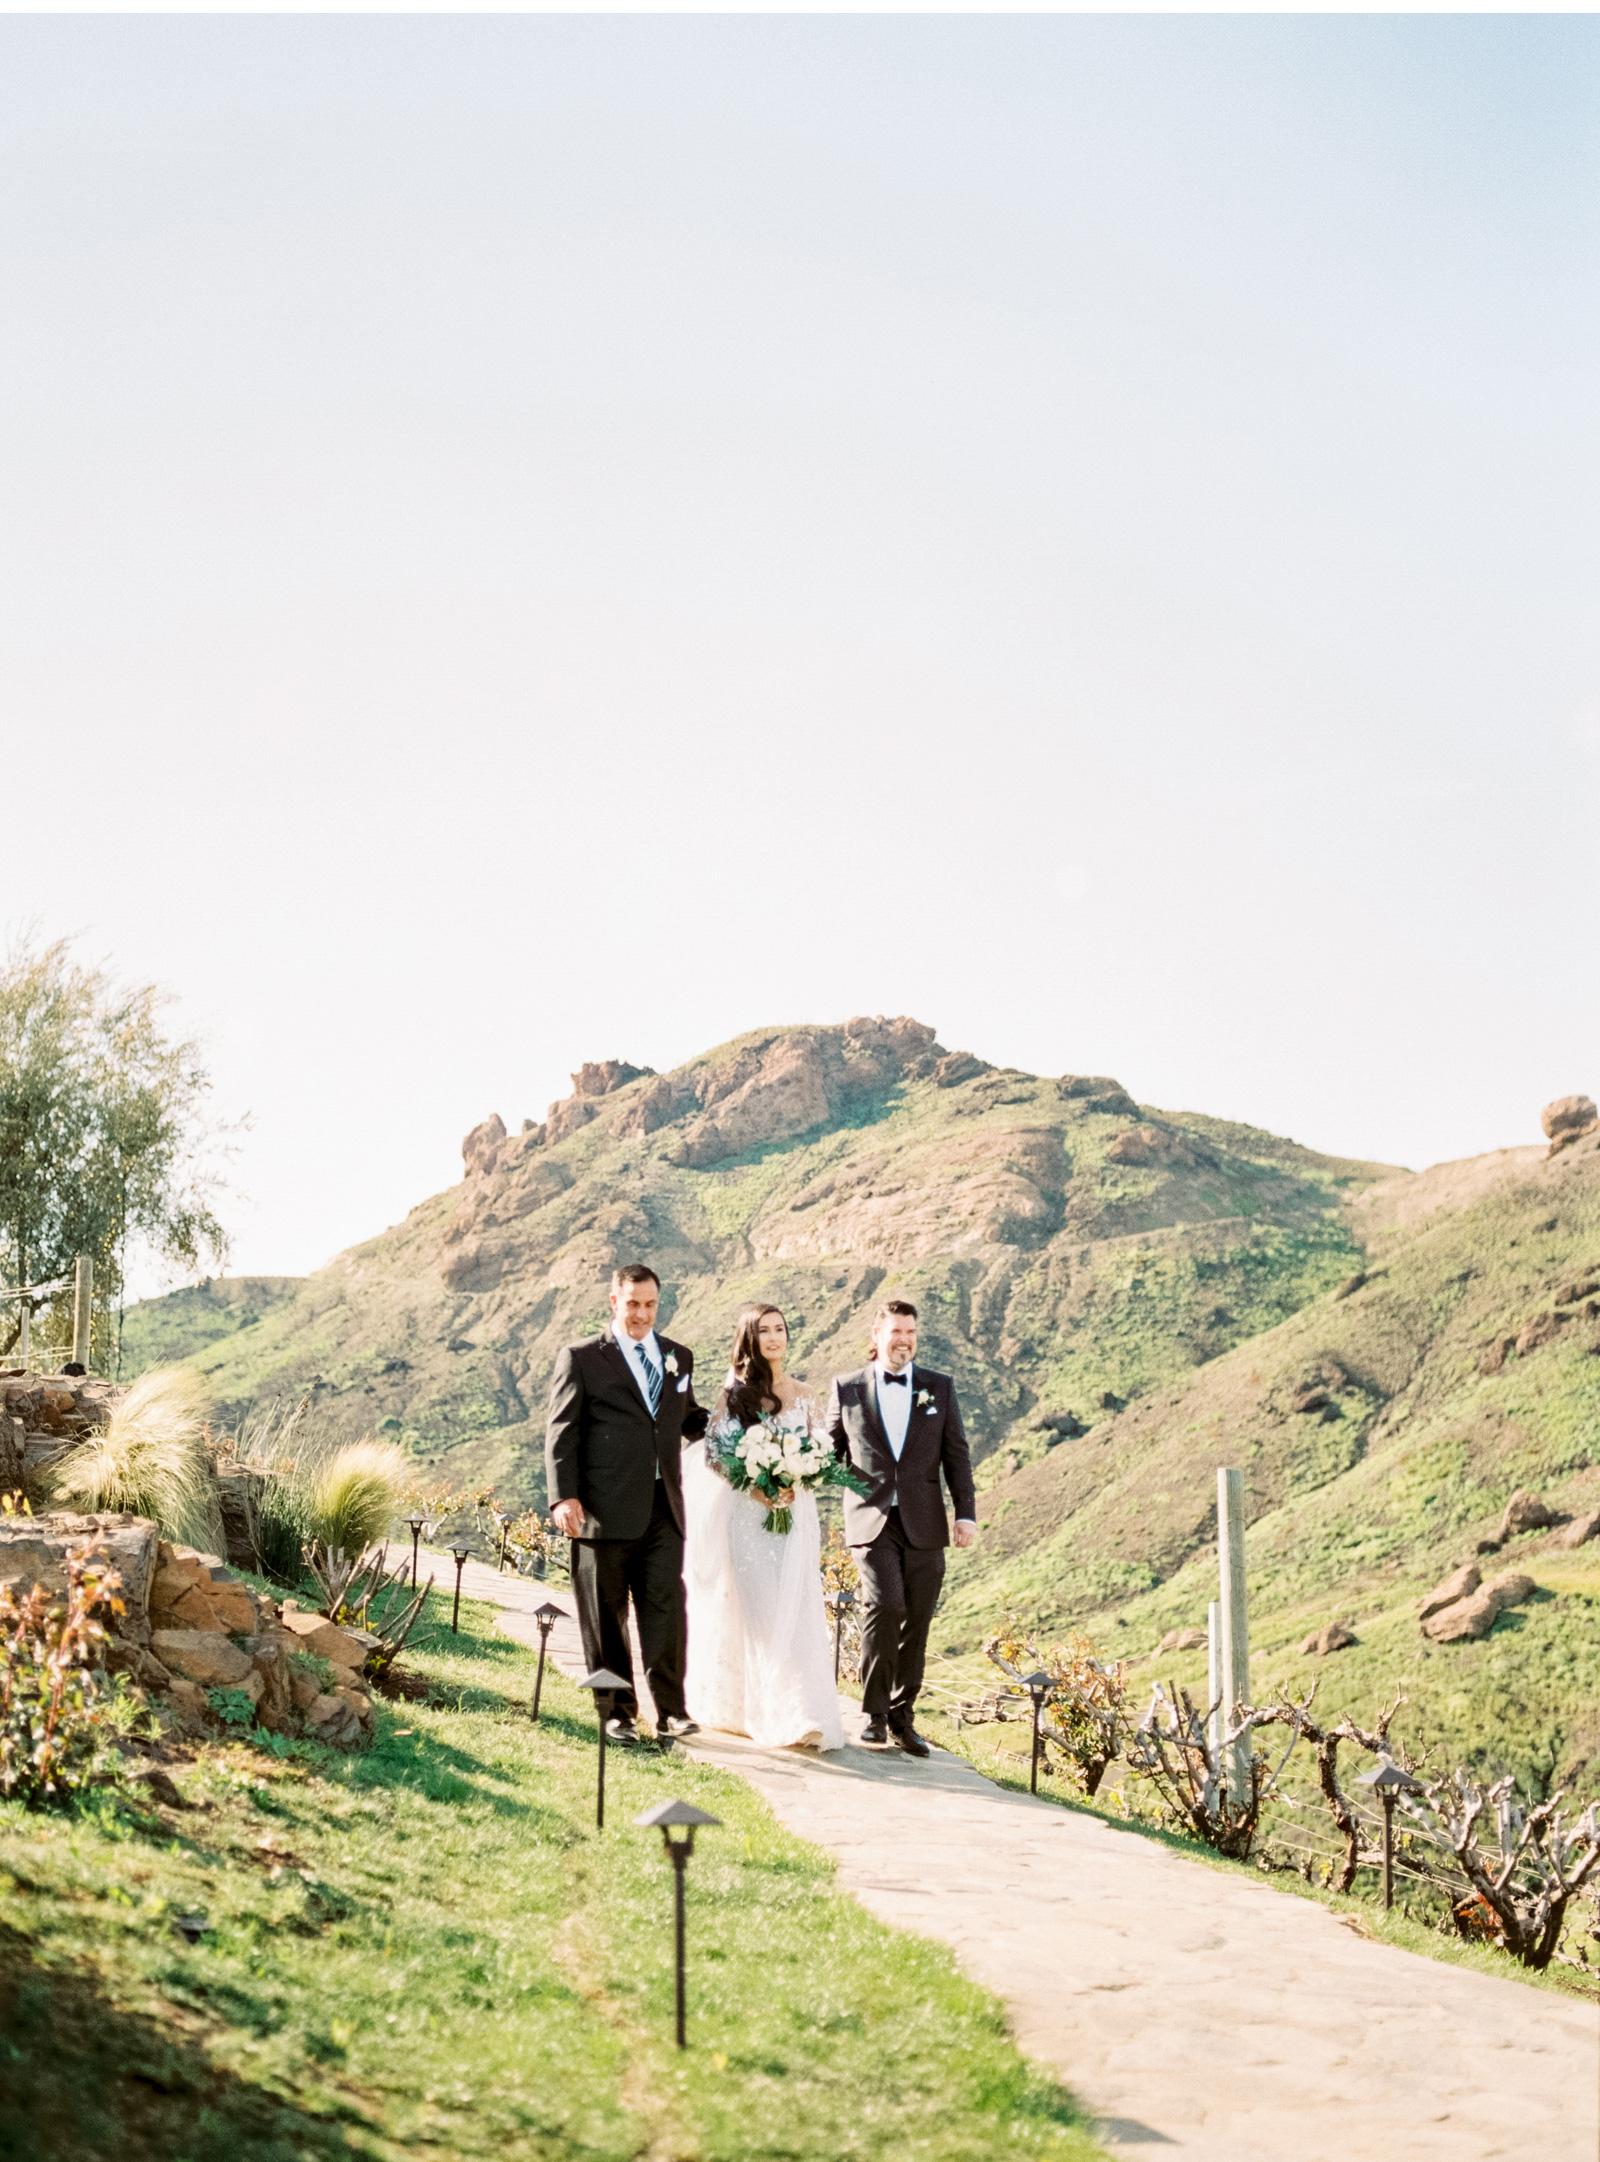 West-Coast-Weddings-Southern-California-Wedding-Photographer-Style-Me-Pretty-Fine-Art-Triunfo-Creek-Malibu-Natalie-Schutt-Photography_07.jpg